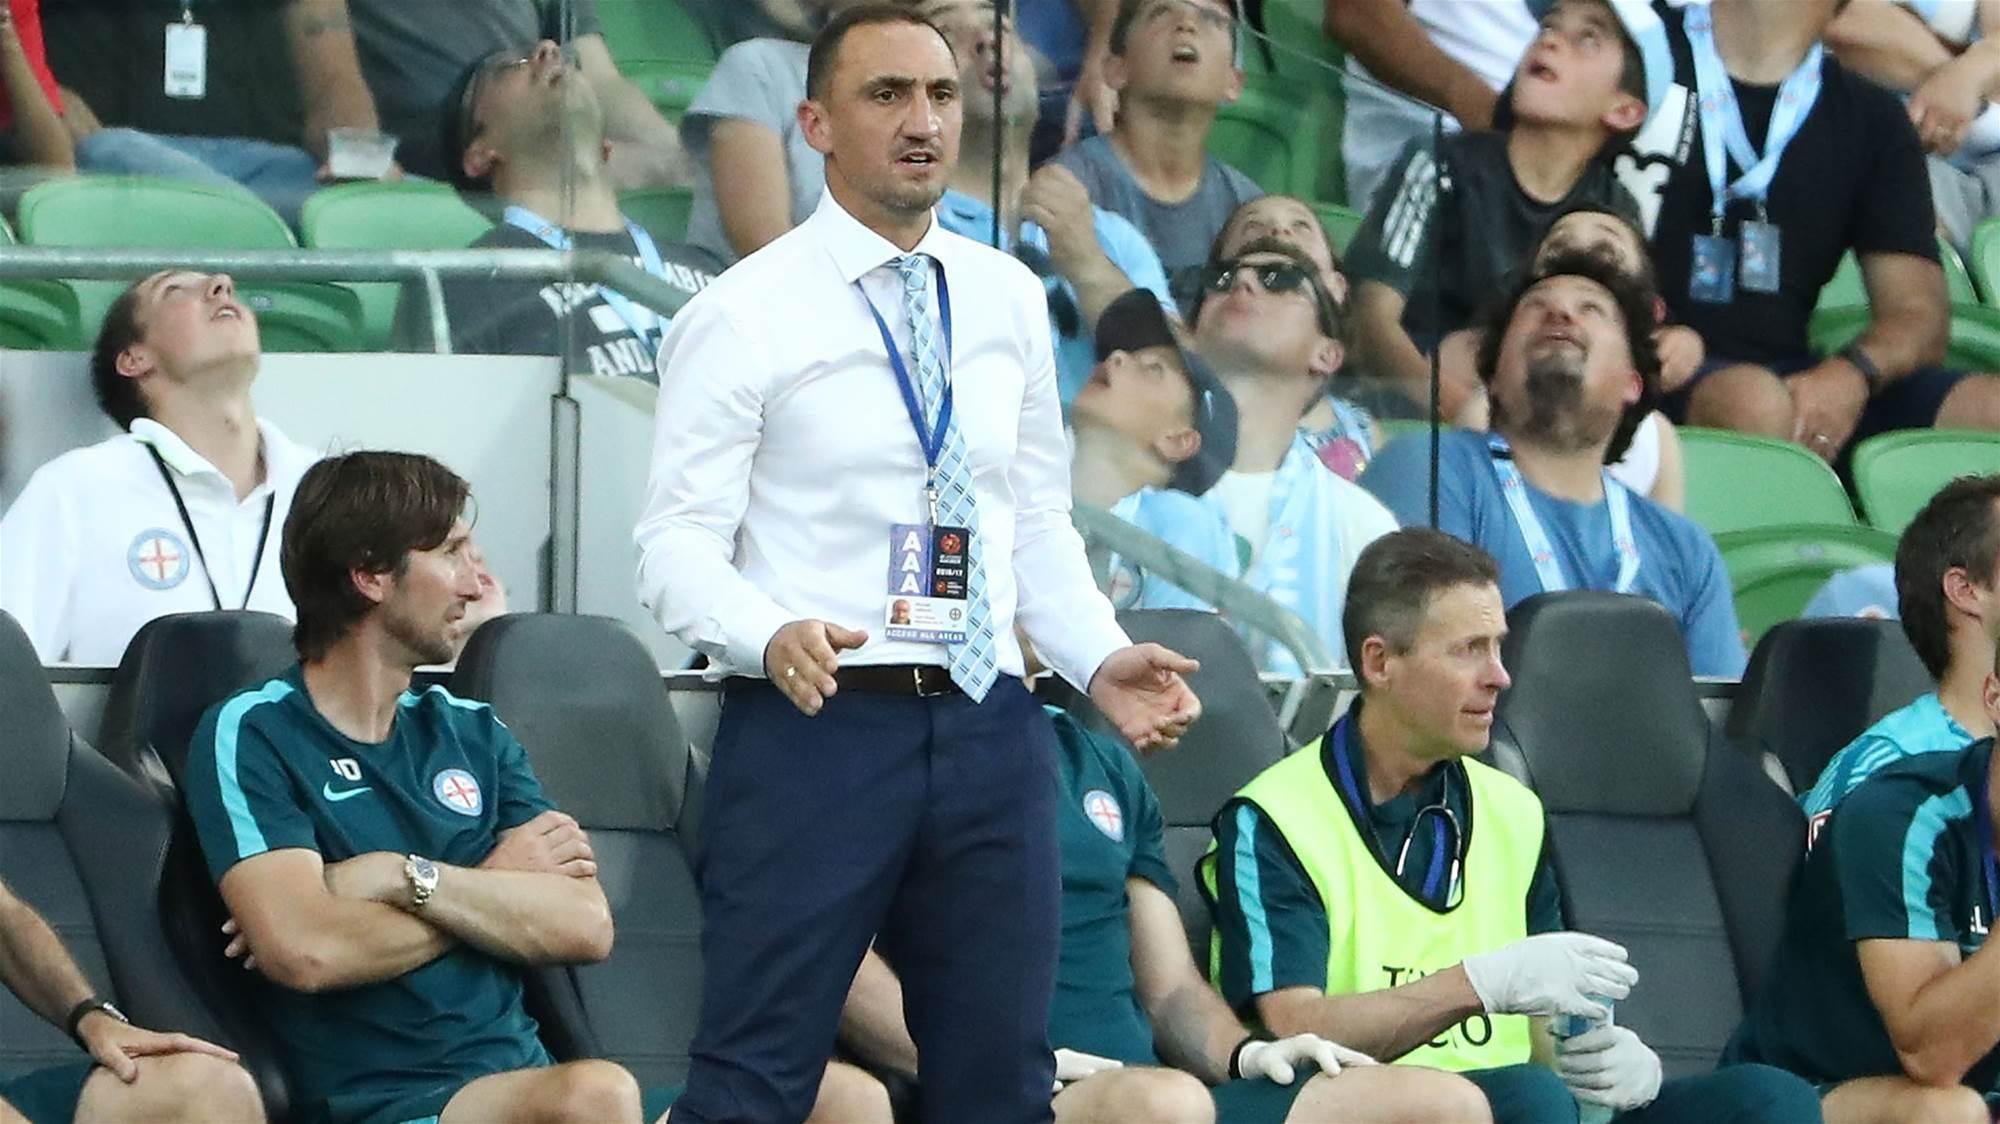 Valkanis still annoyed at Colazo disallowed goal